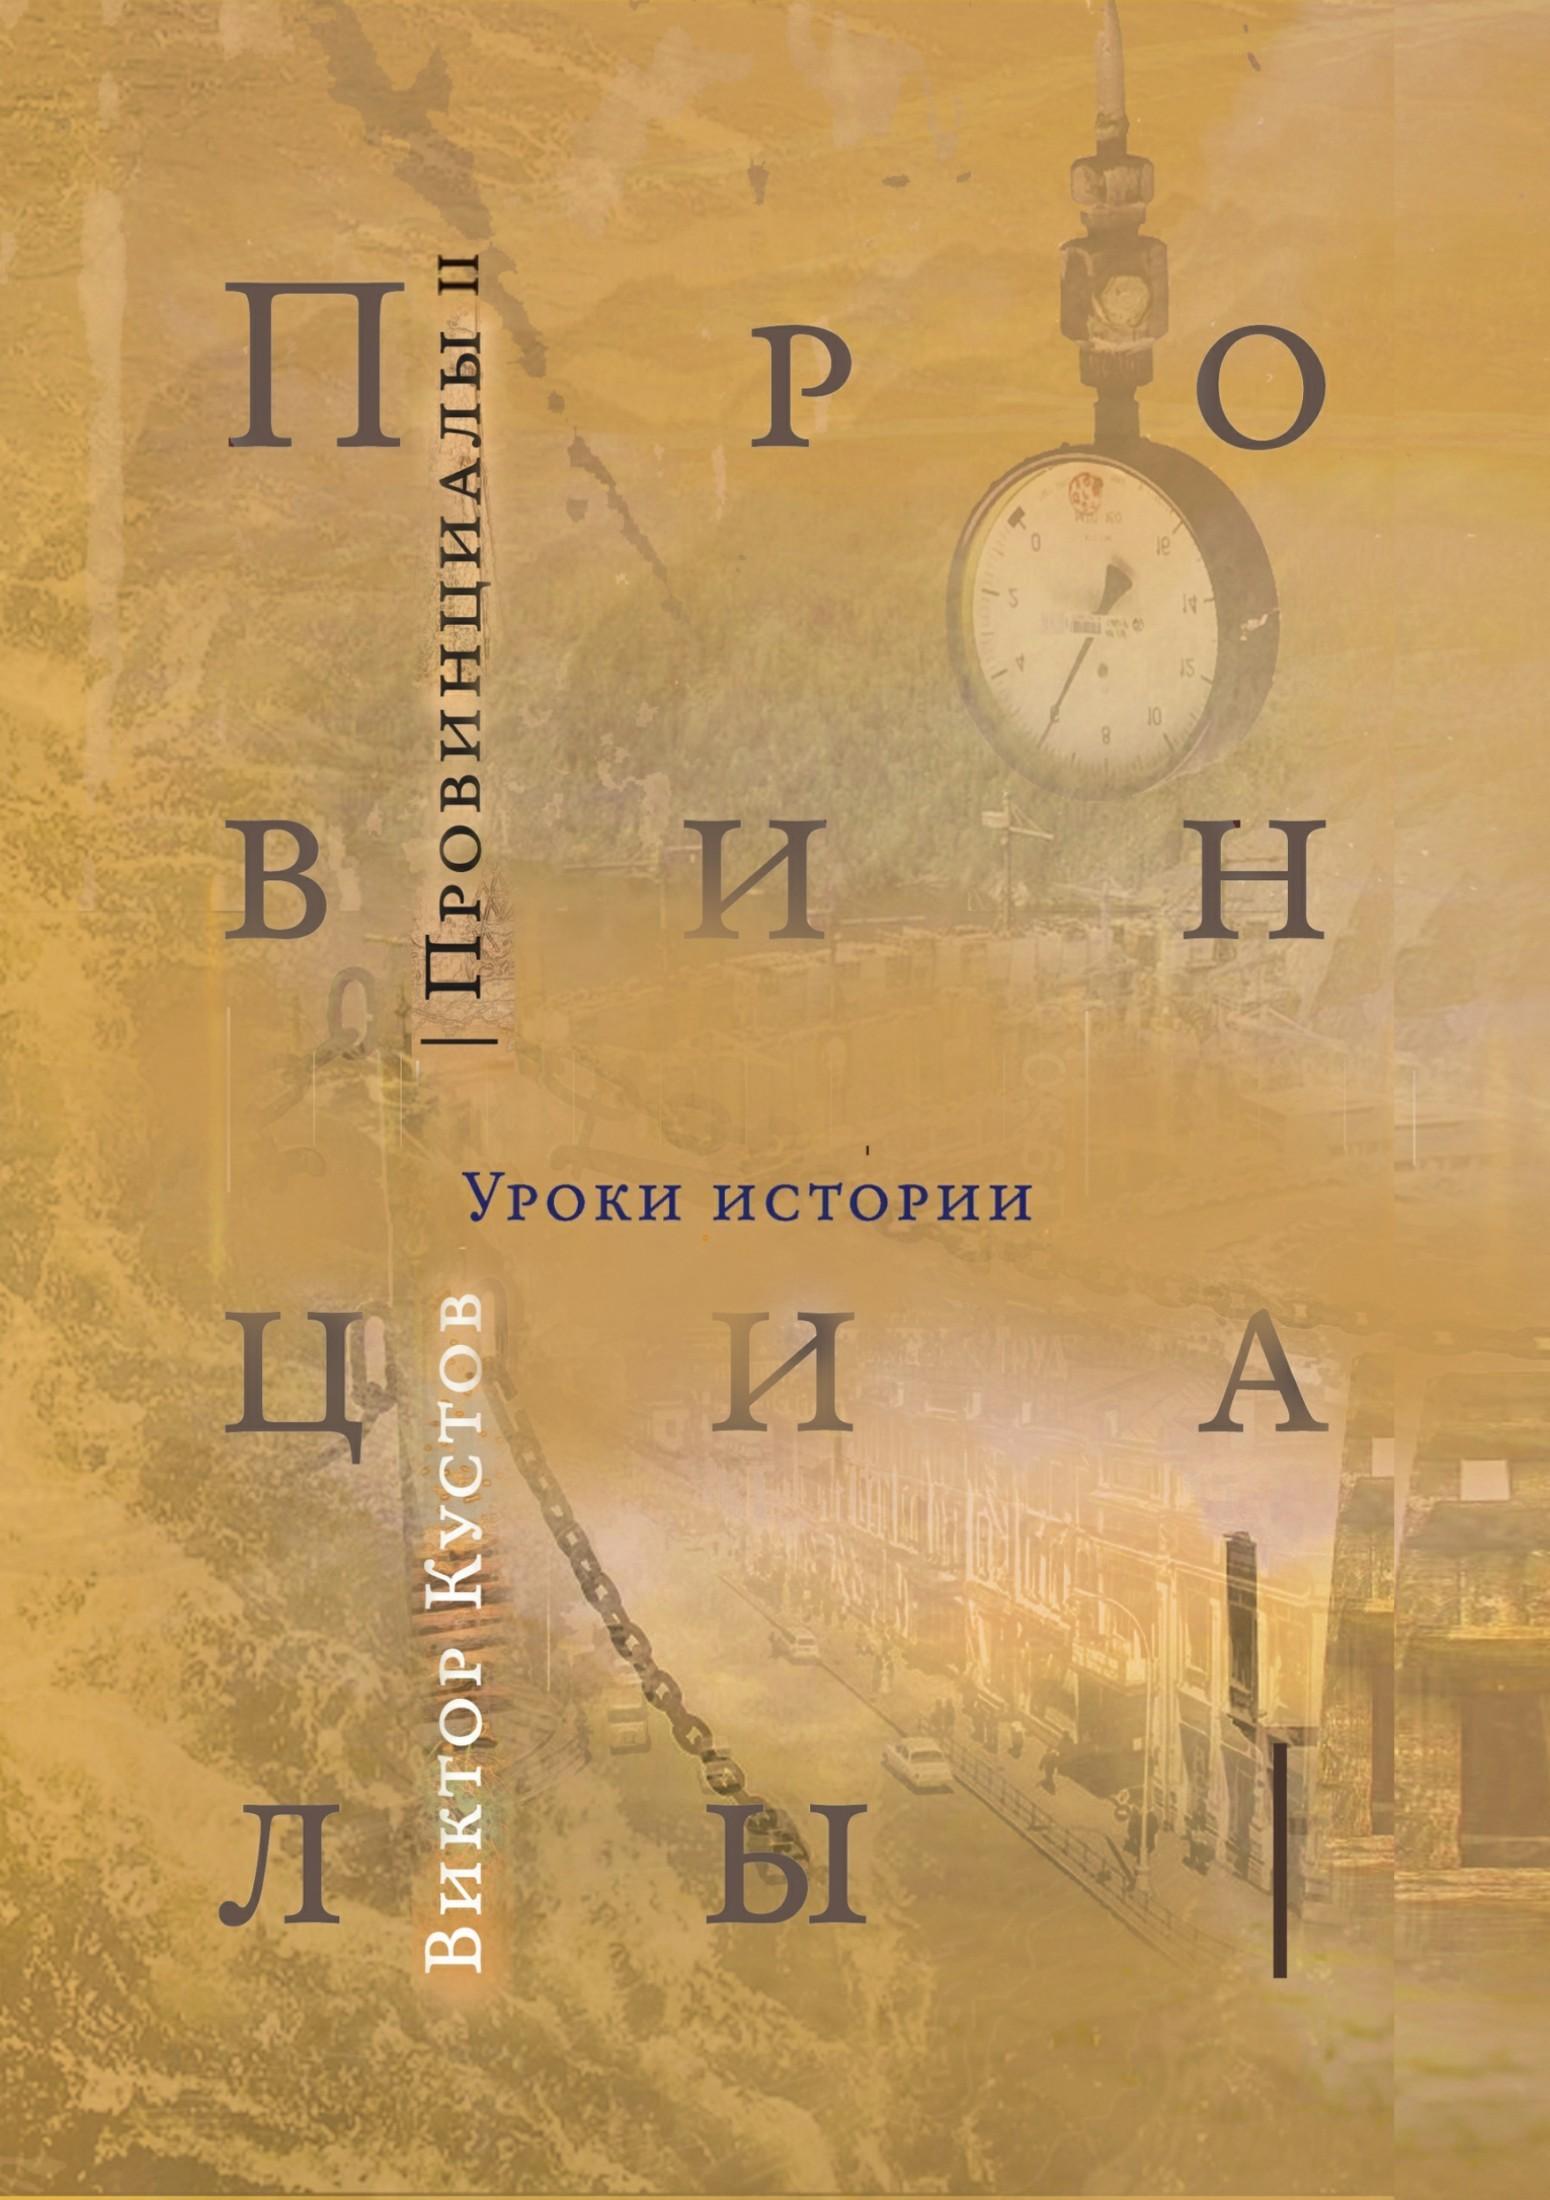 Виктор Николаевич Кустов Провинциалы. Книга 2. Уроки истории